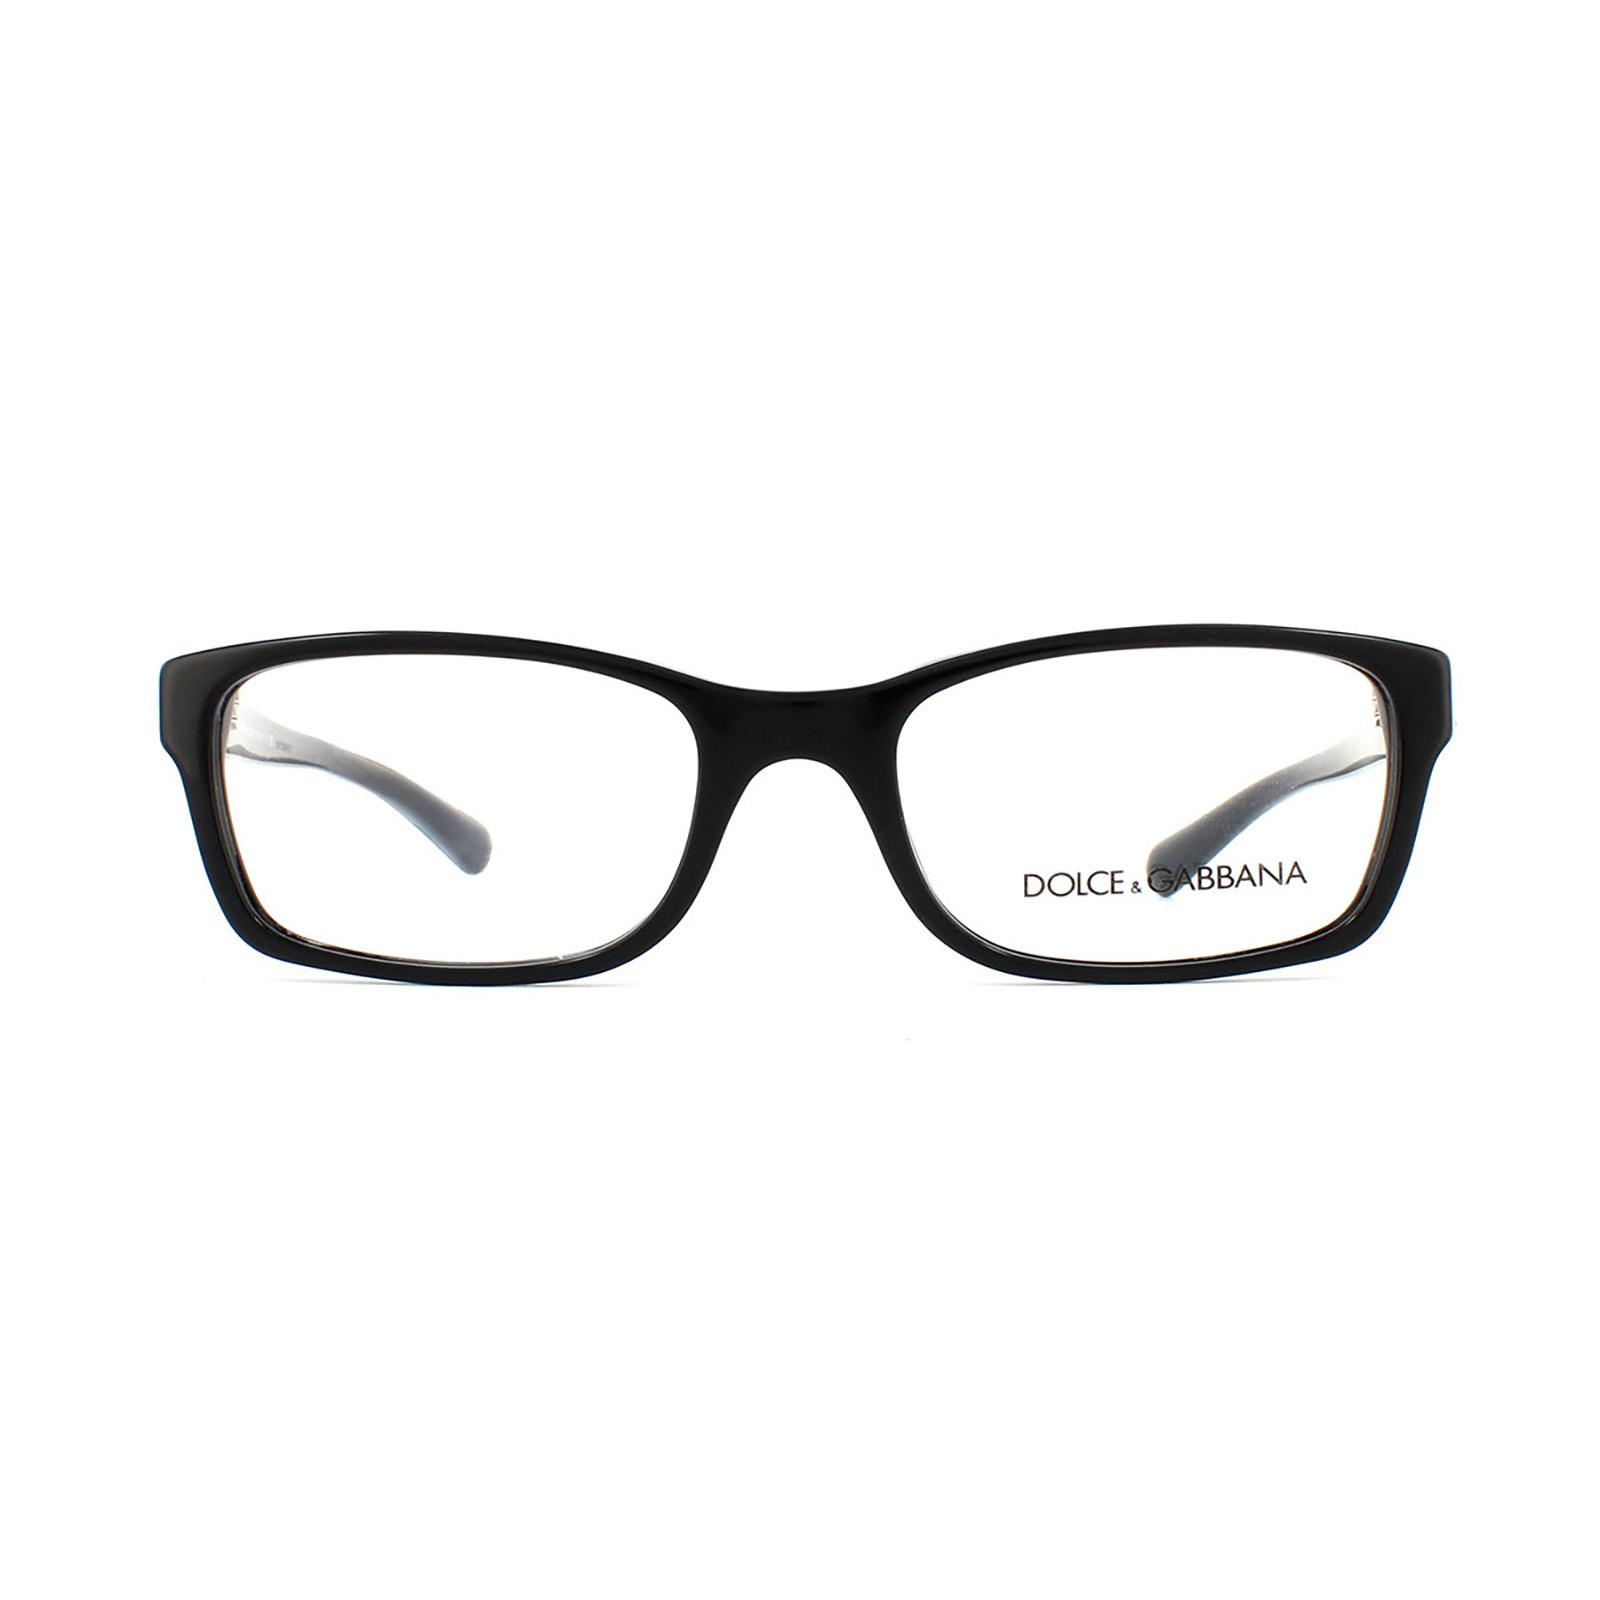 sentinel dolce and gabbana glasses frames 3170 501 black womens 51mm - Dolce And Gabbana Glasses Frames